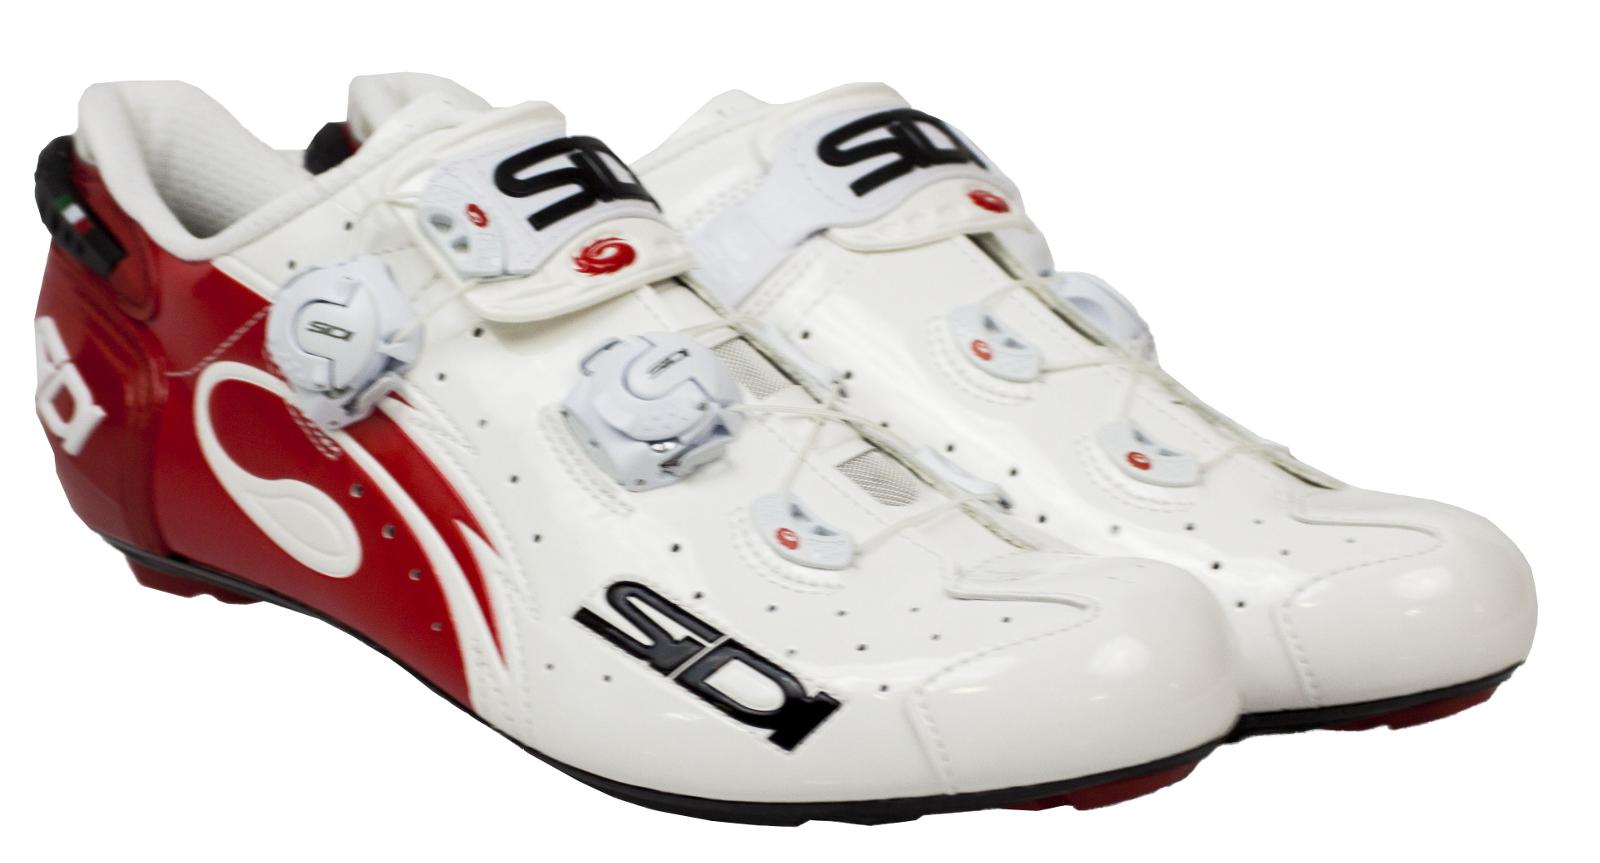 Footwear: Sidi Road Shoes Review | Sidi Carbon Cycling Shoes | Sidi ...